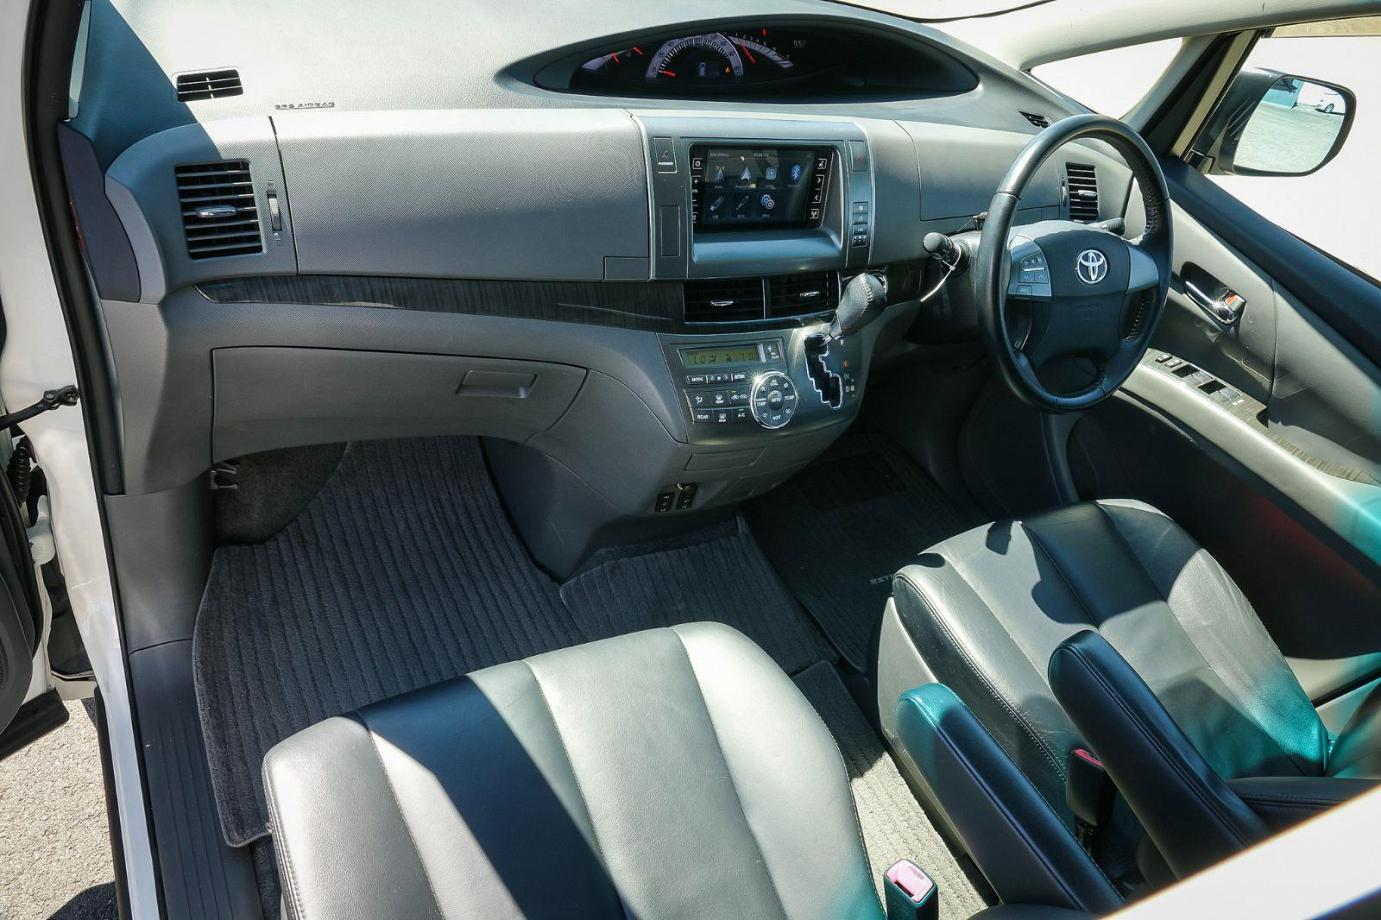 2009 Toyota Estima ACR50 Aeras Leather - Package Wagon 7st 5dr Auto 2.4i